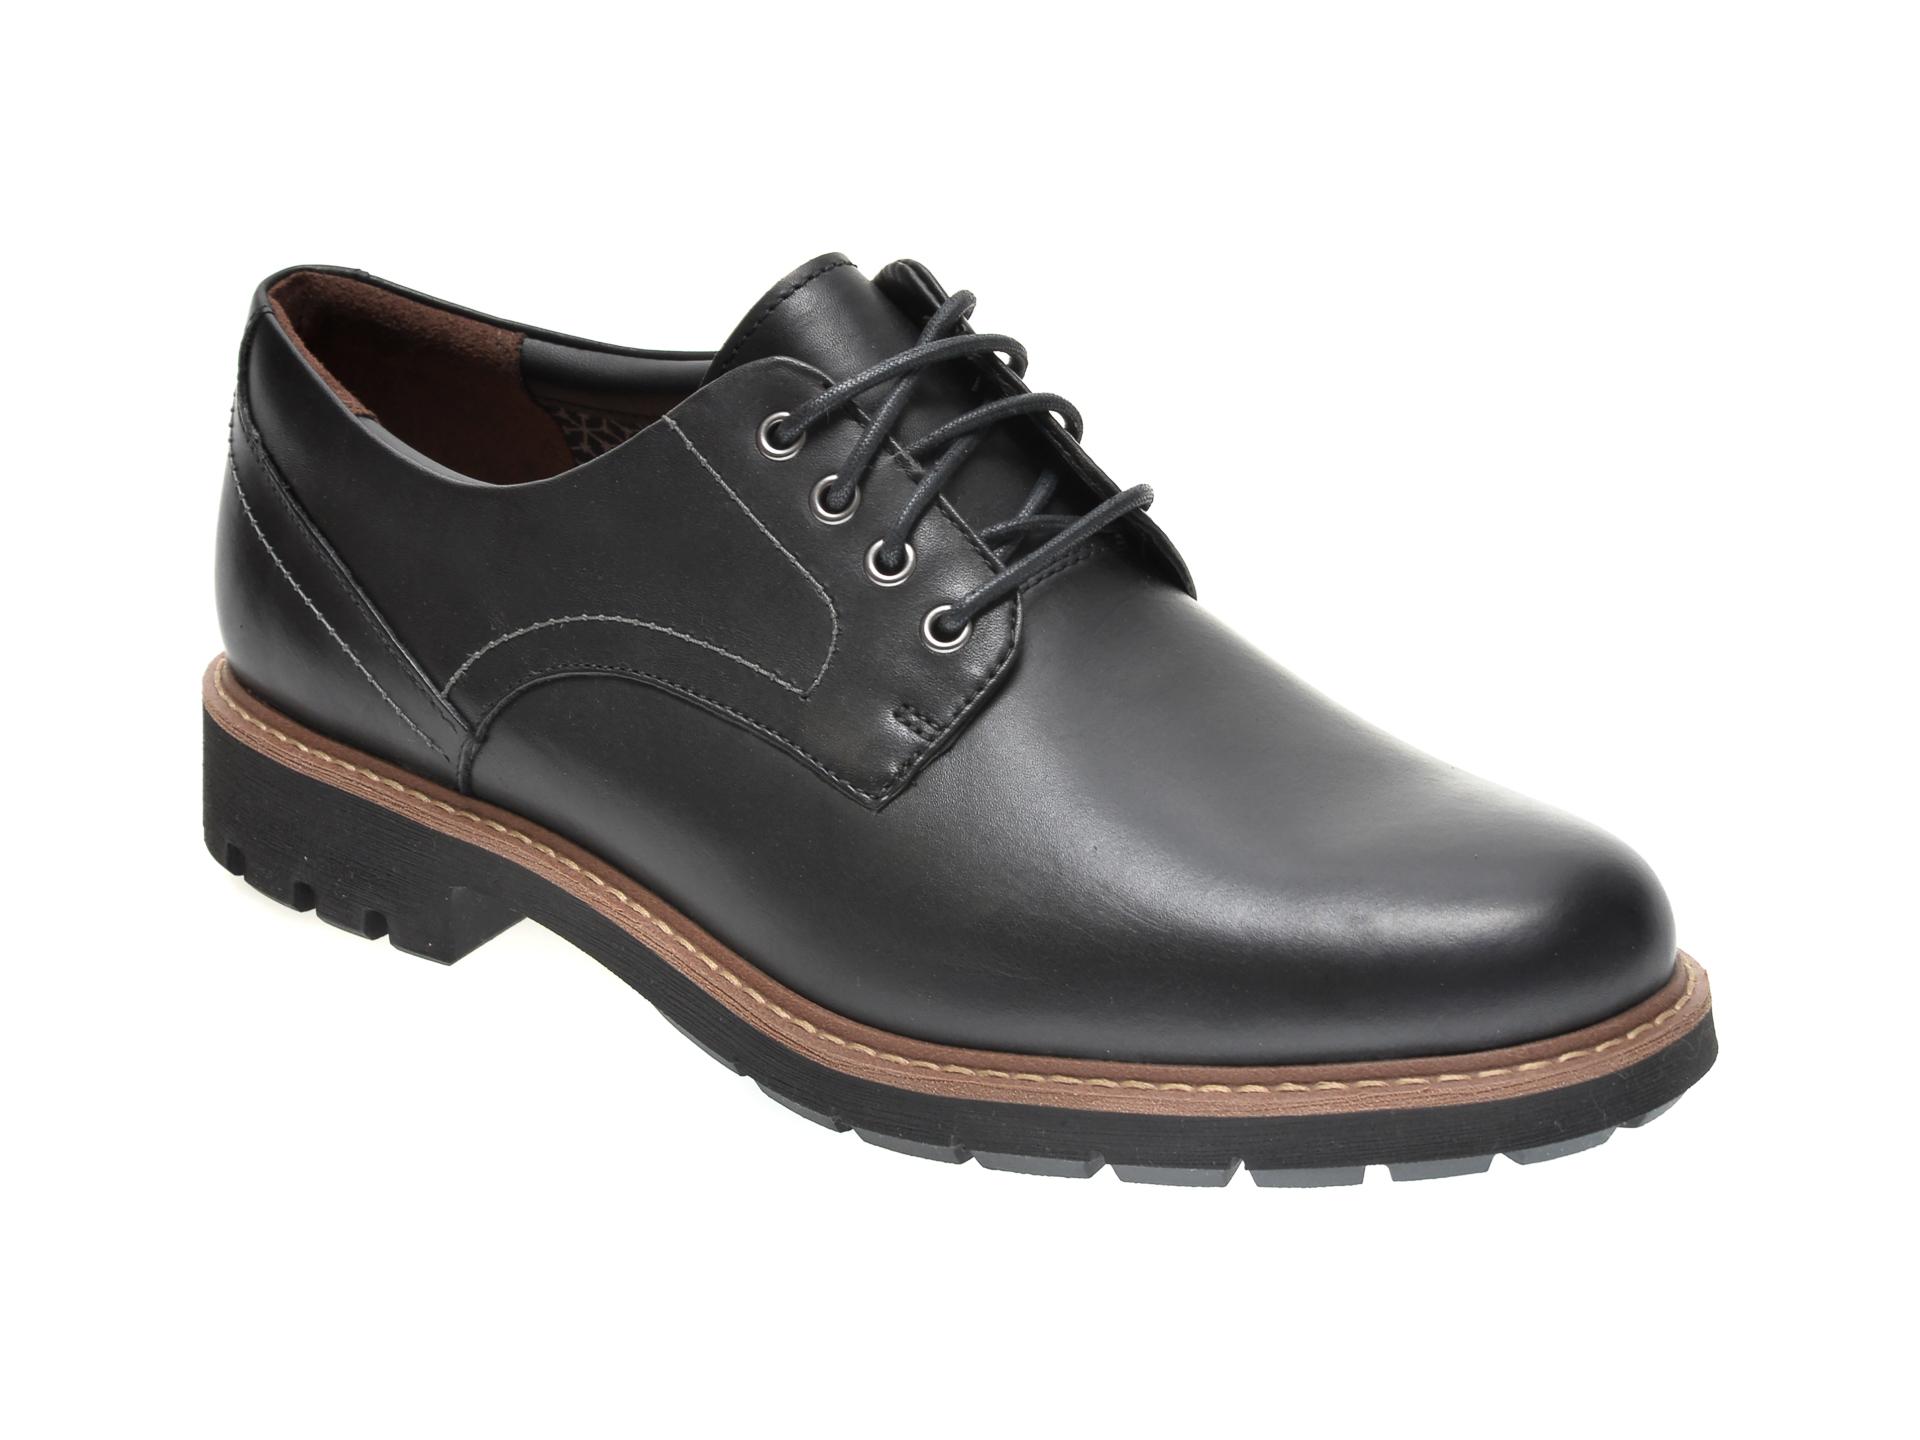 Pantofi CLARKS negri, BATCOMBE HALL, din piele naturala imagine